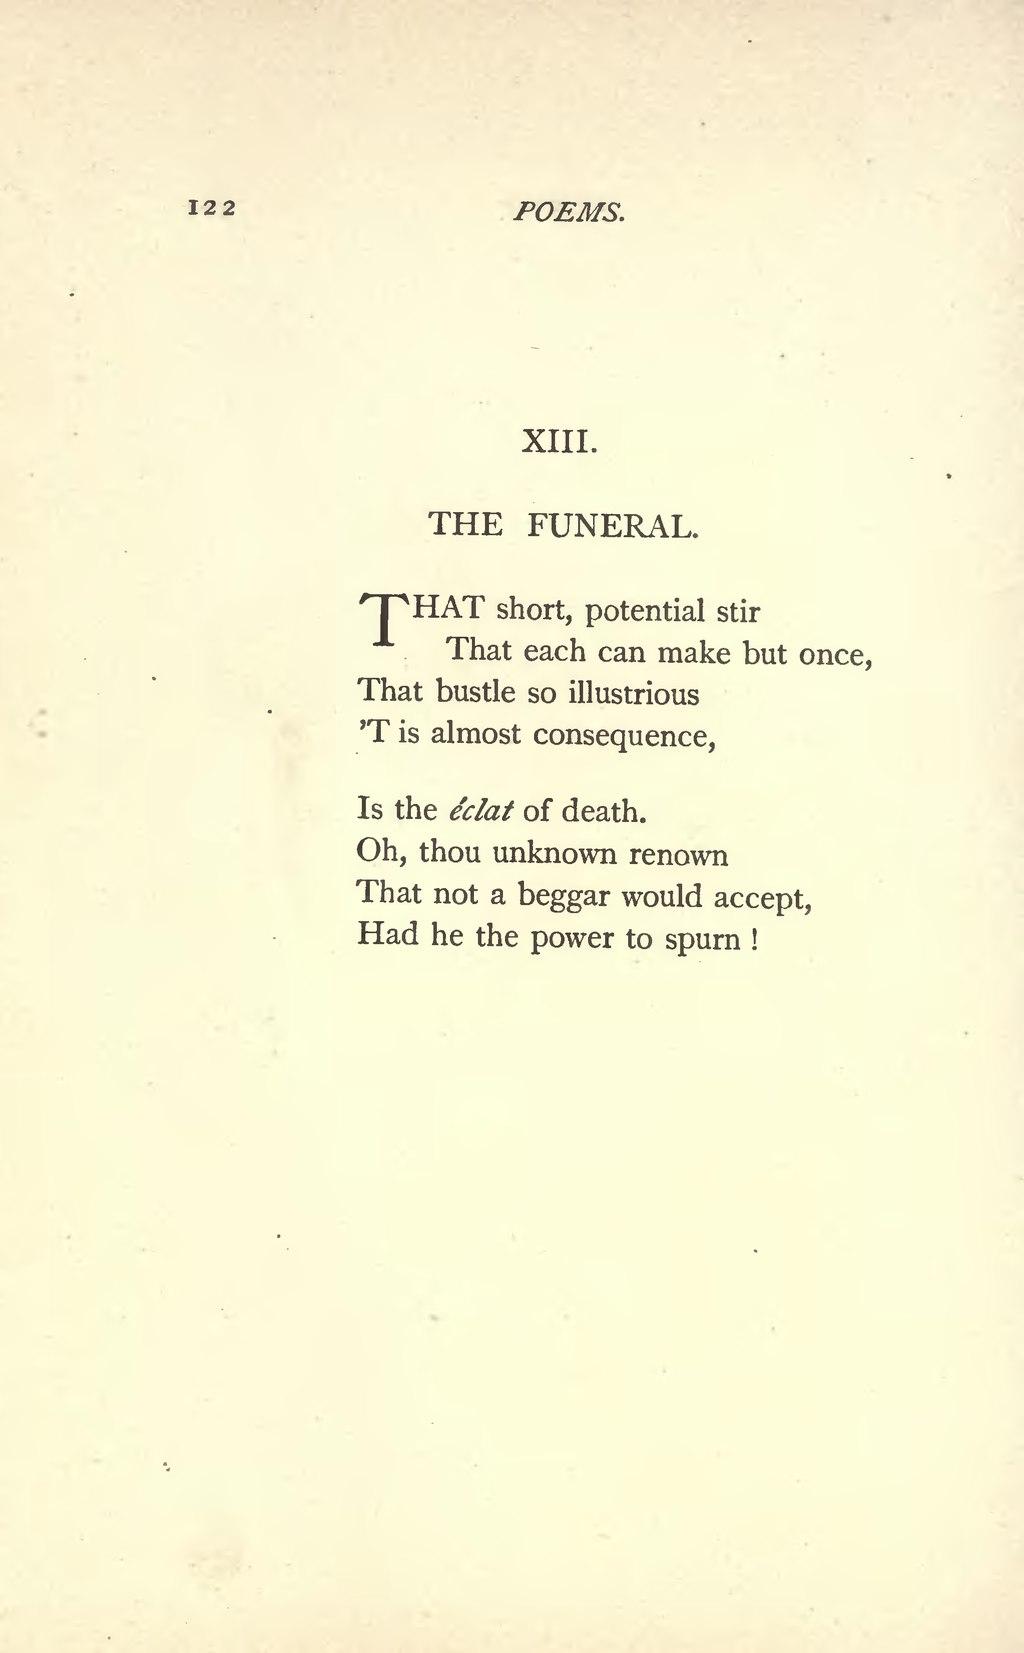 page emily dickinson poems  1890  djvu  130